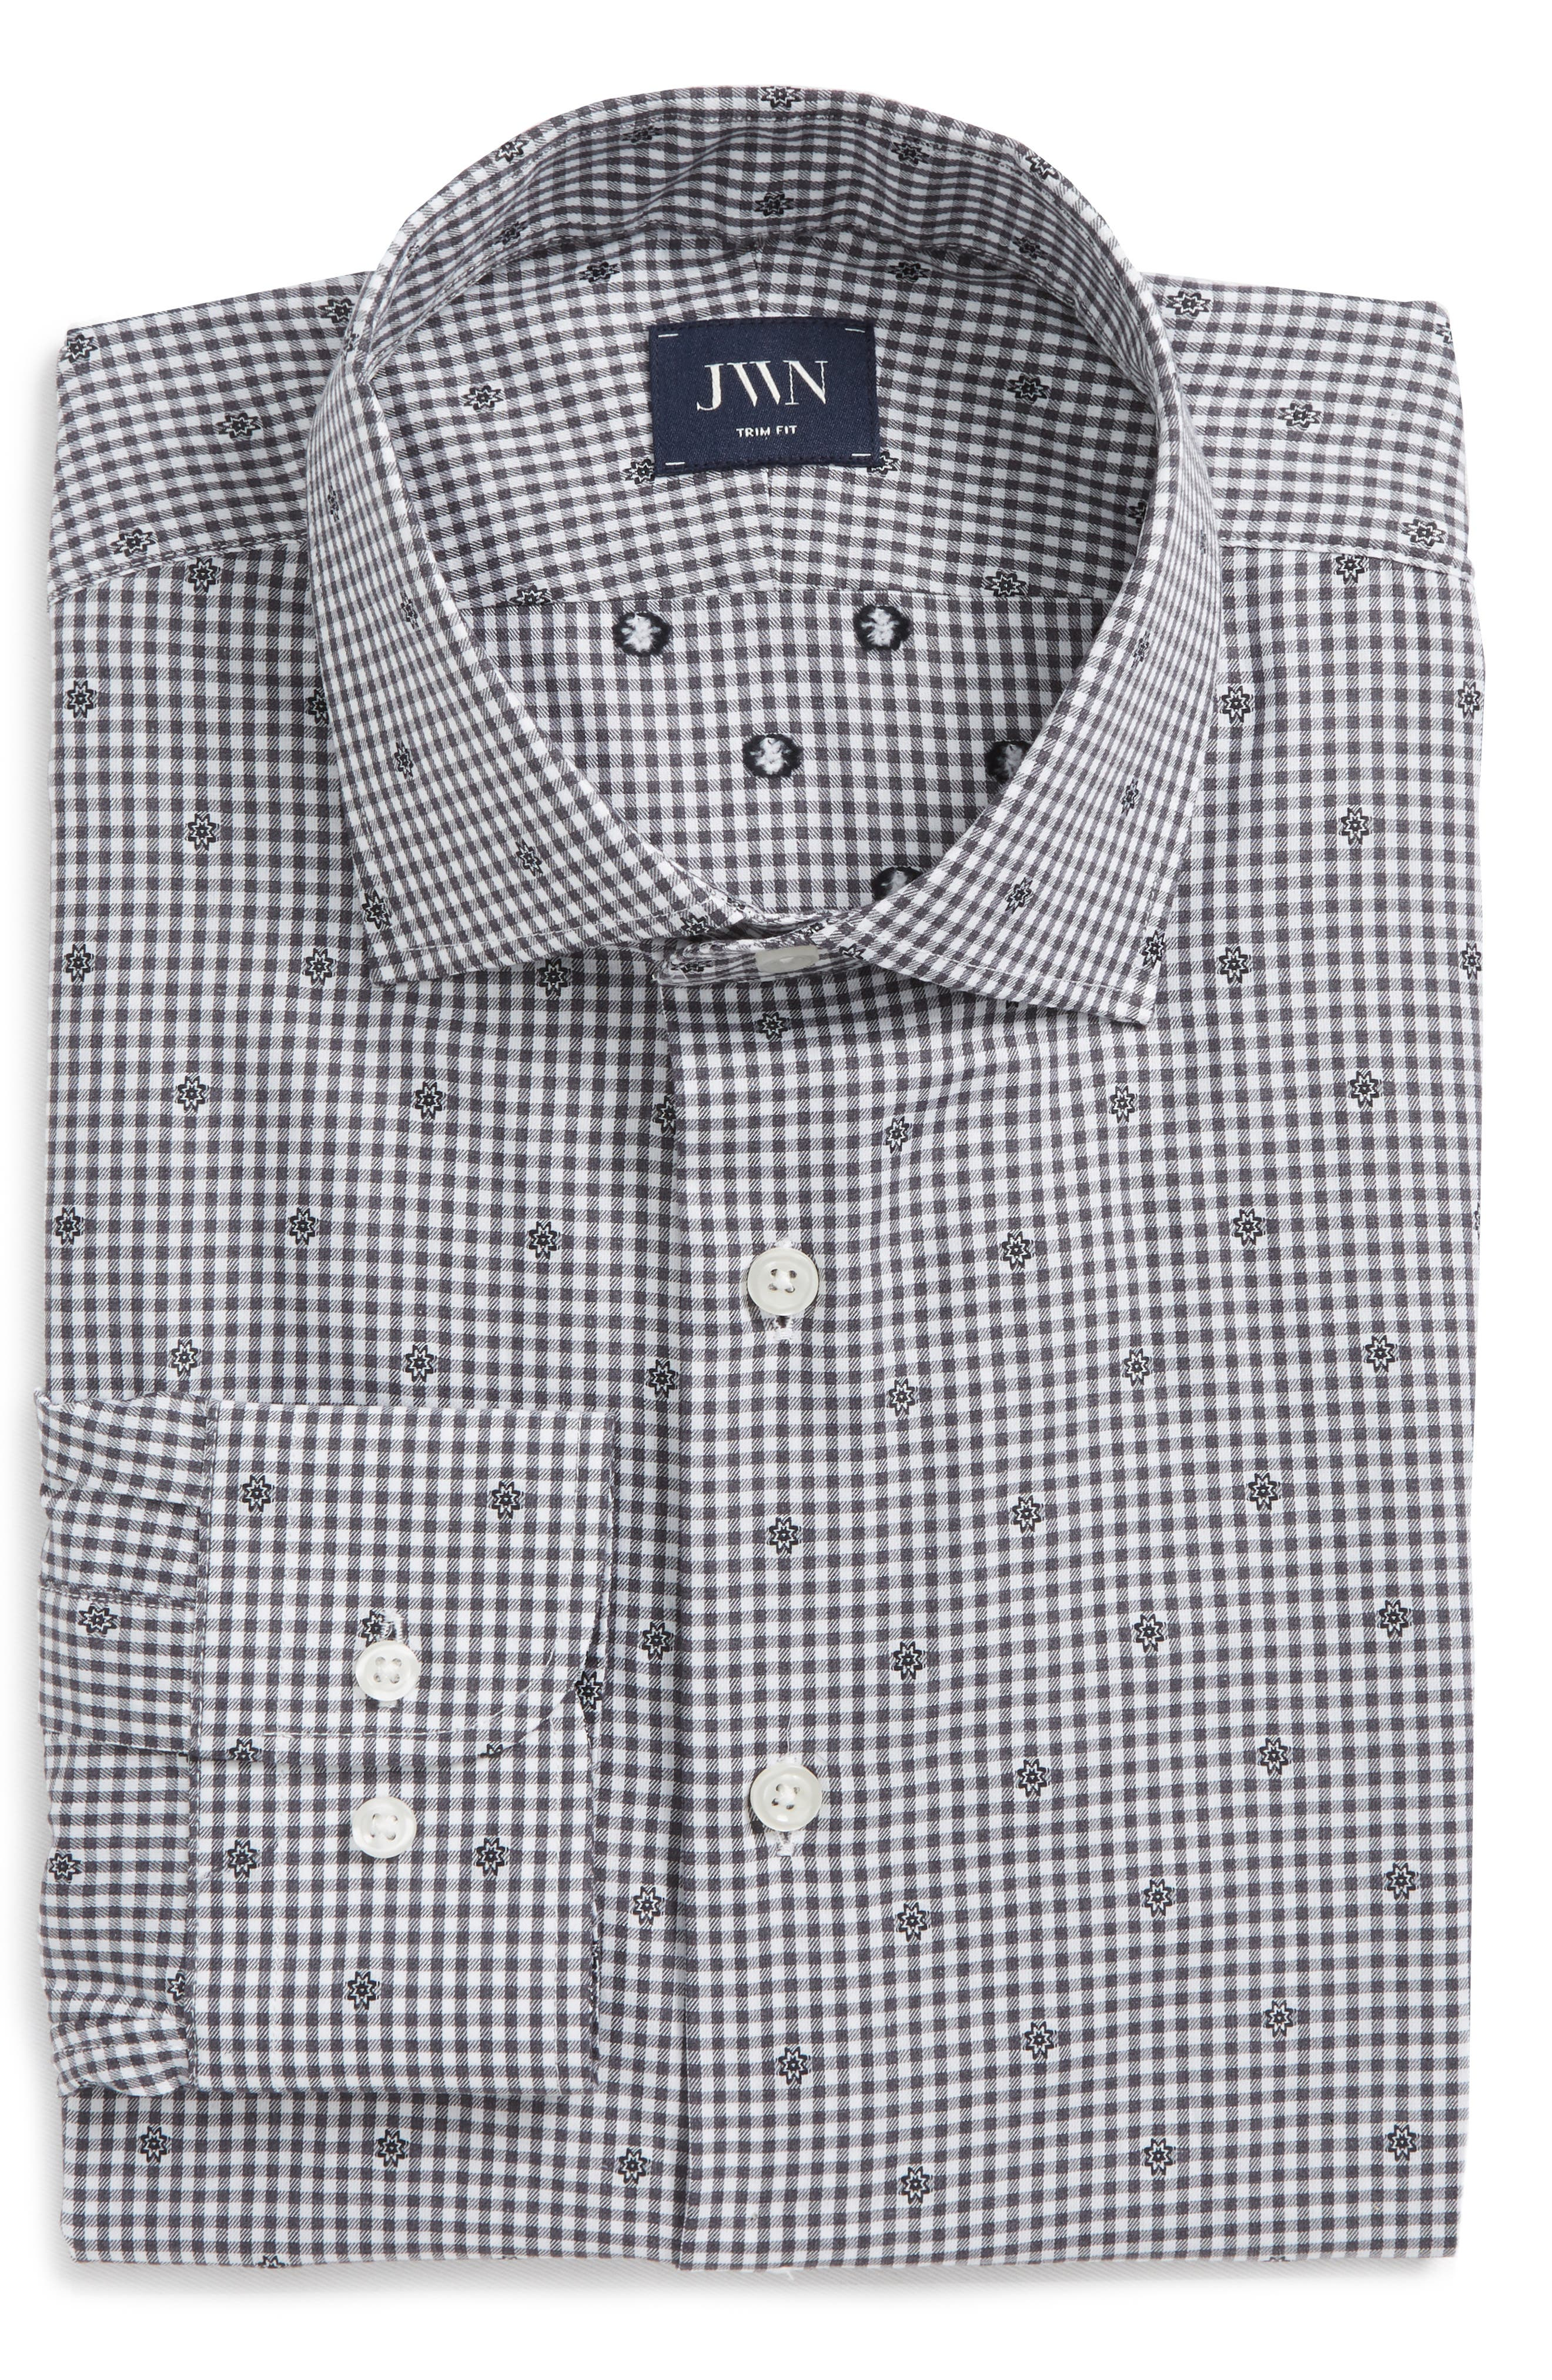 Trim Fit Check Dress Shirt,                             Alternate thumbnail 6, color,                             Grey Onyx